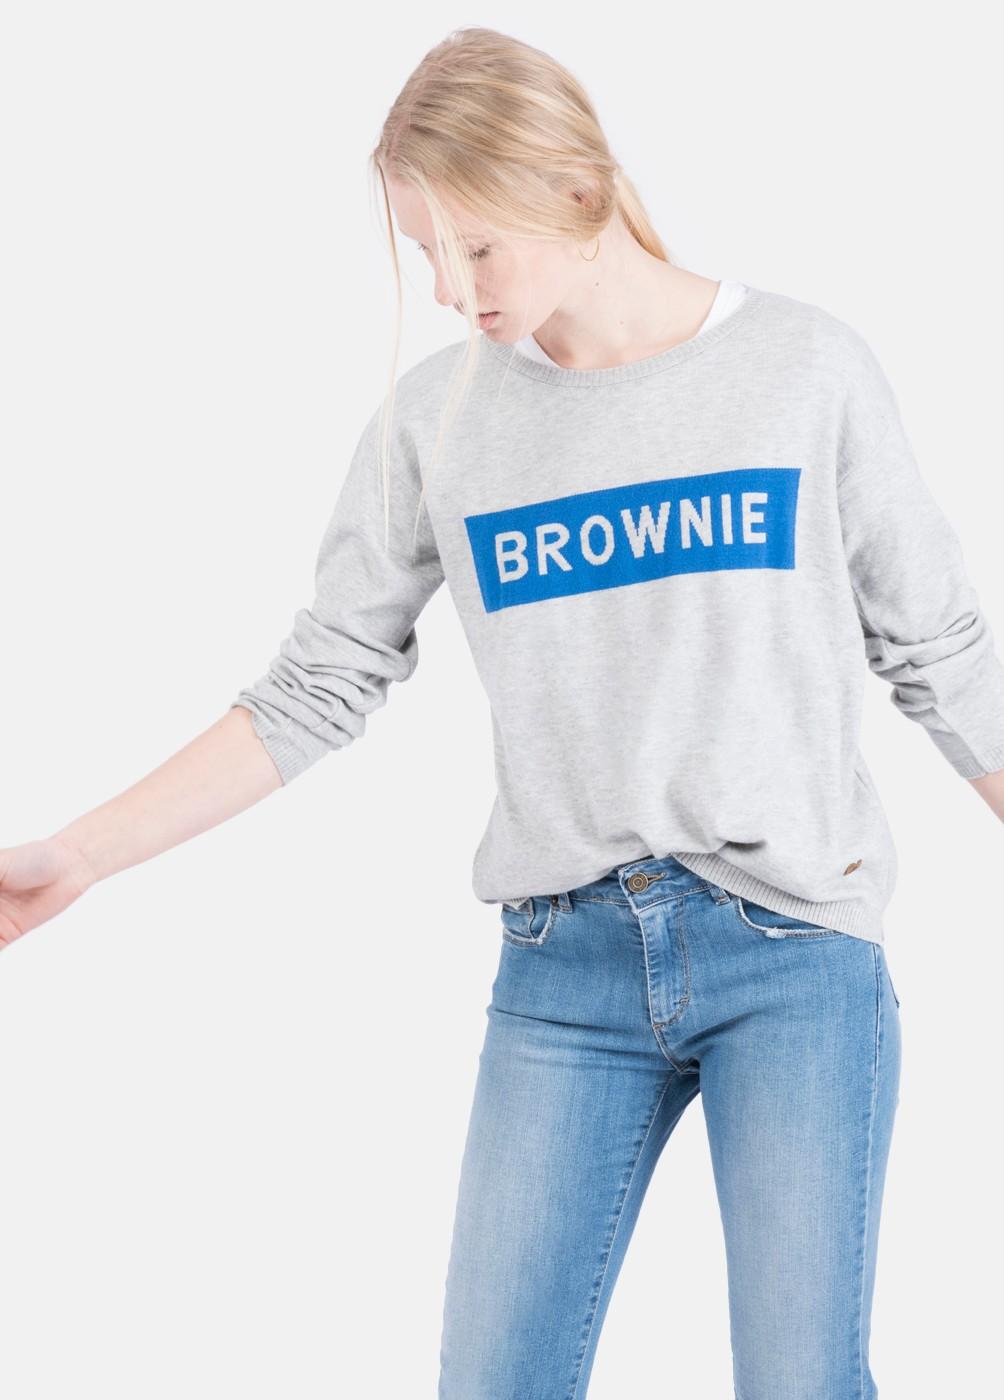 GALA SWEATER BROWNIE